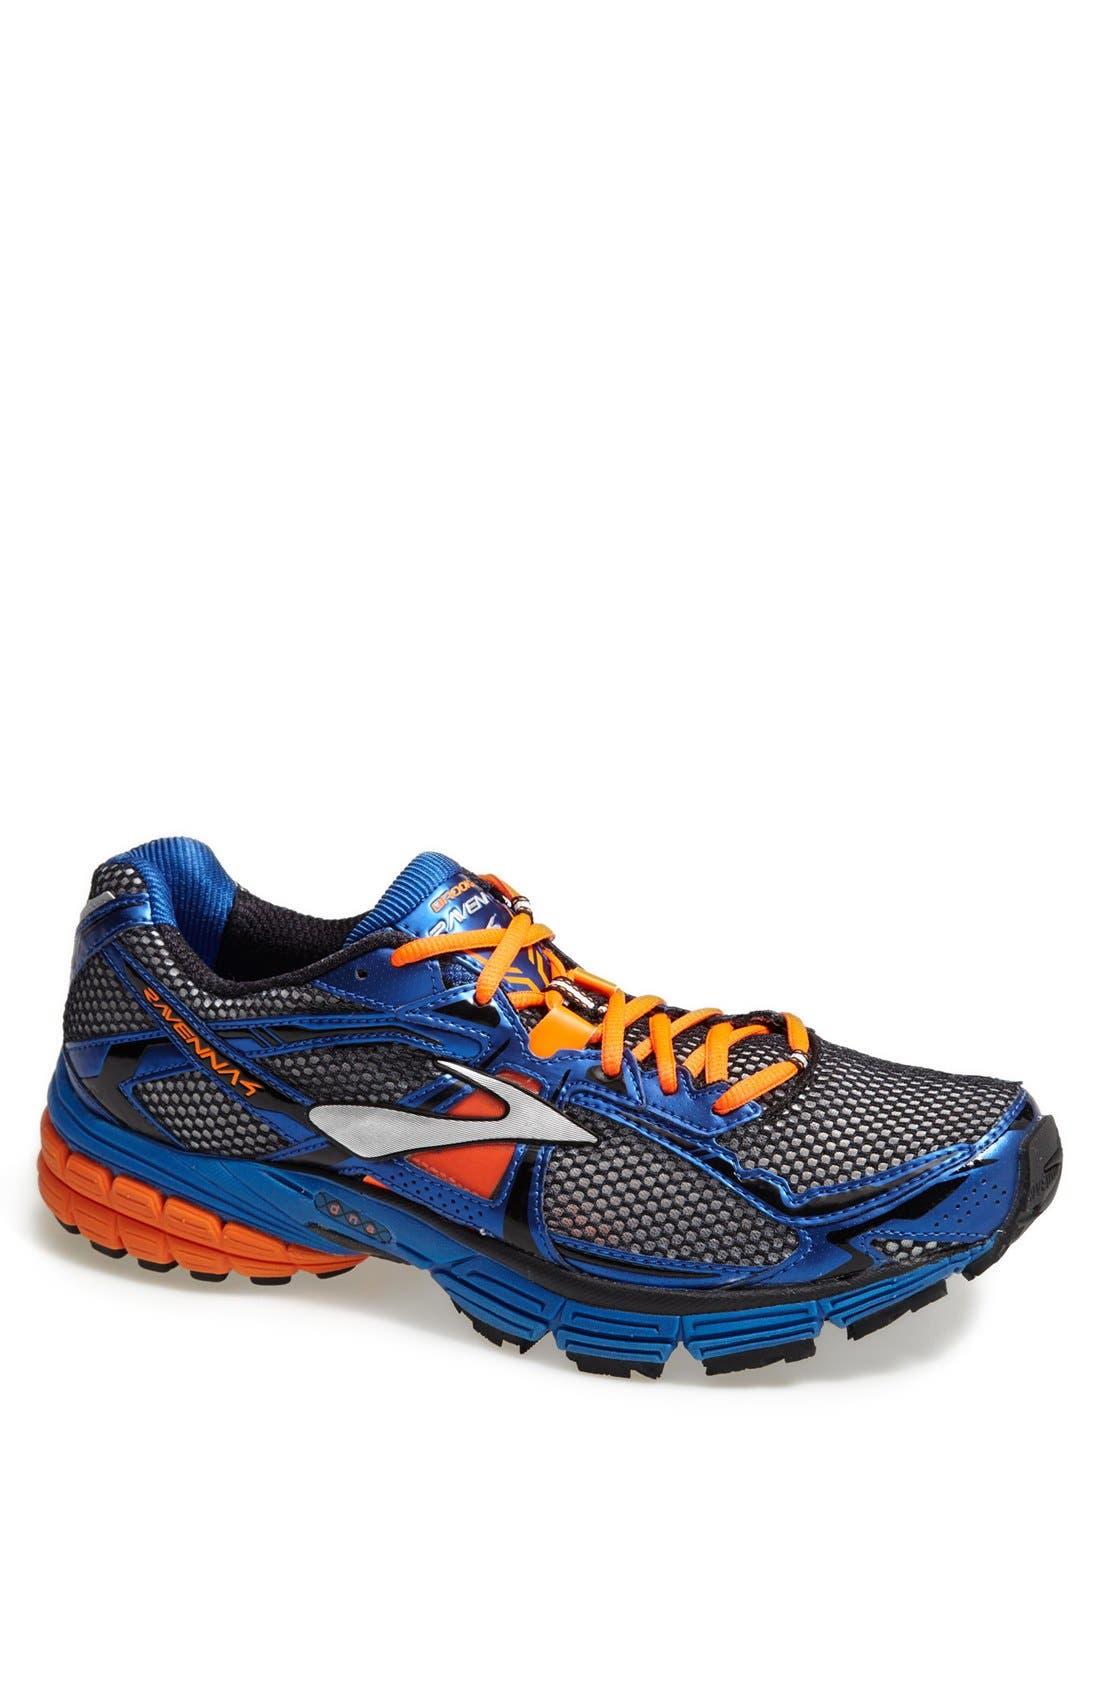 Main Image - Brooks 'Ravenna 4' Running Shoe (Men)